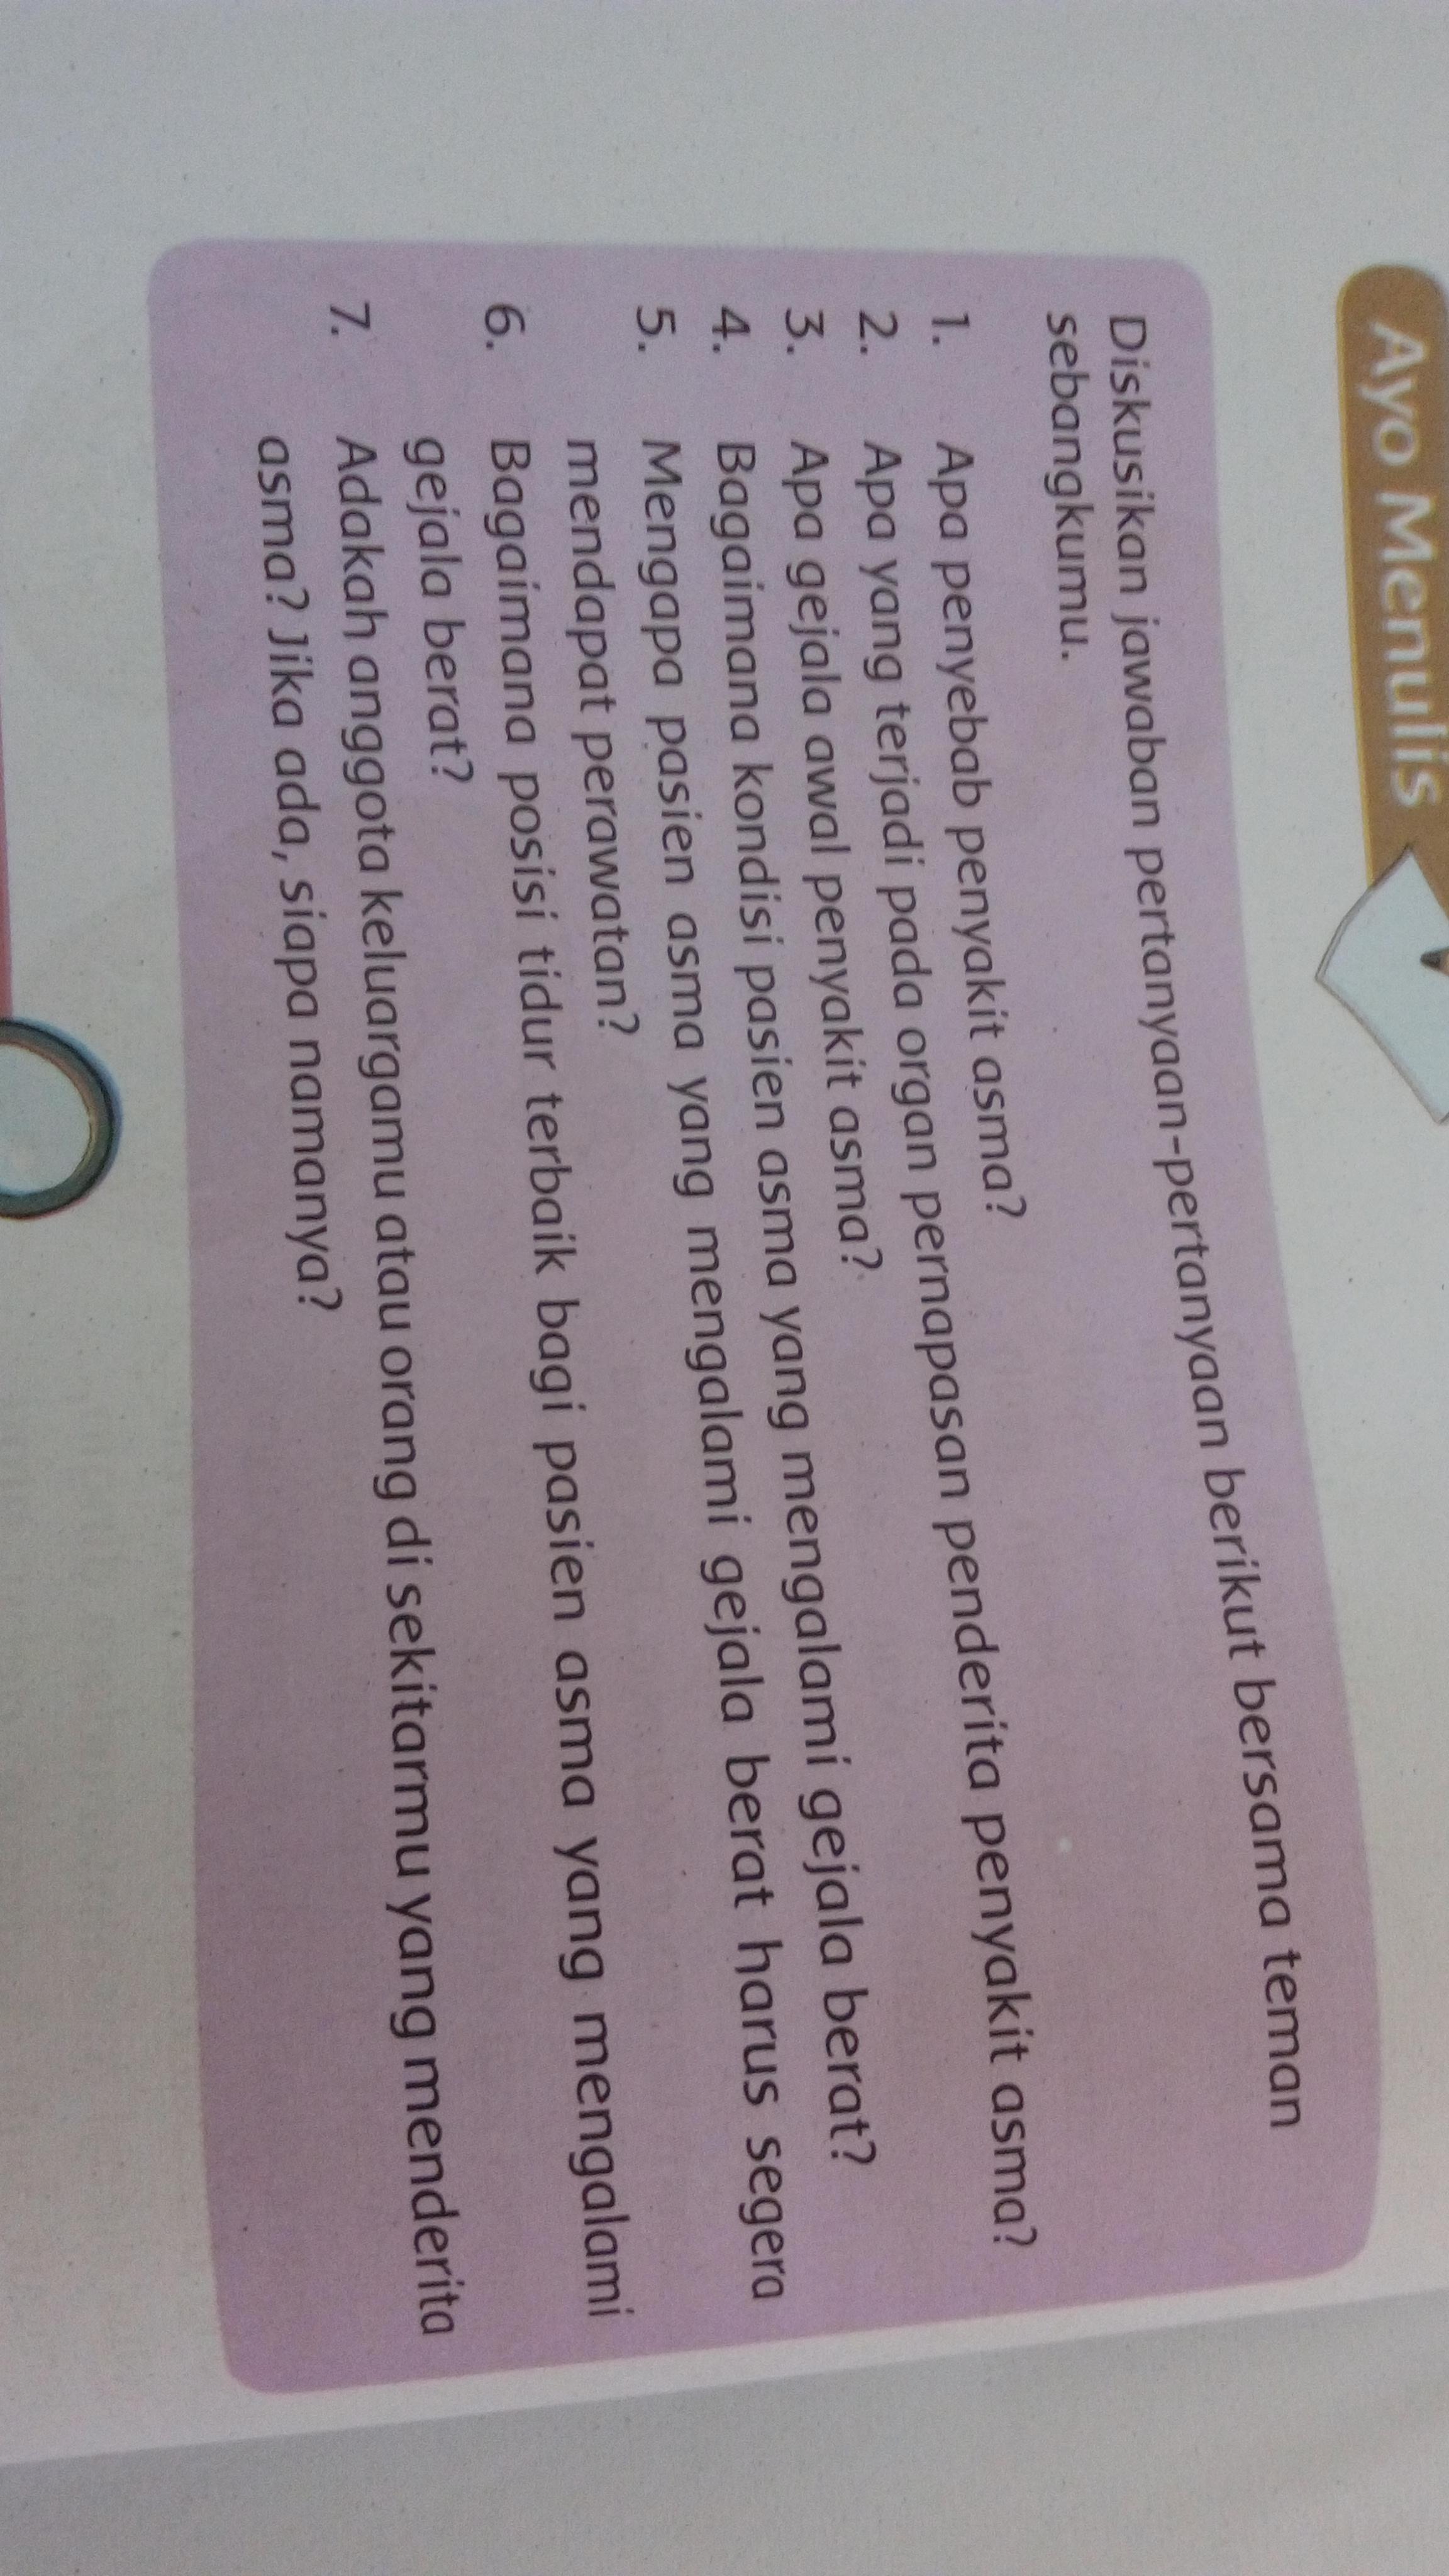 Kunci Jawaban Tema 2 Kelas 5 Halaman 58 Please Tolong Di Jawab Y Brainly Co Id